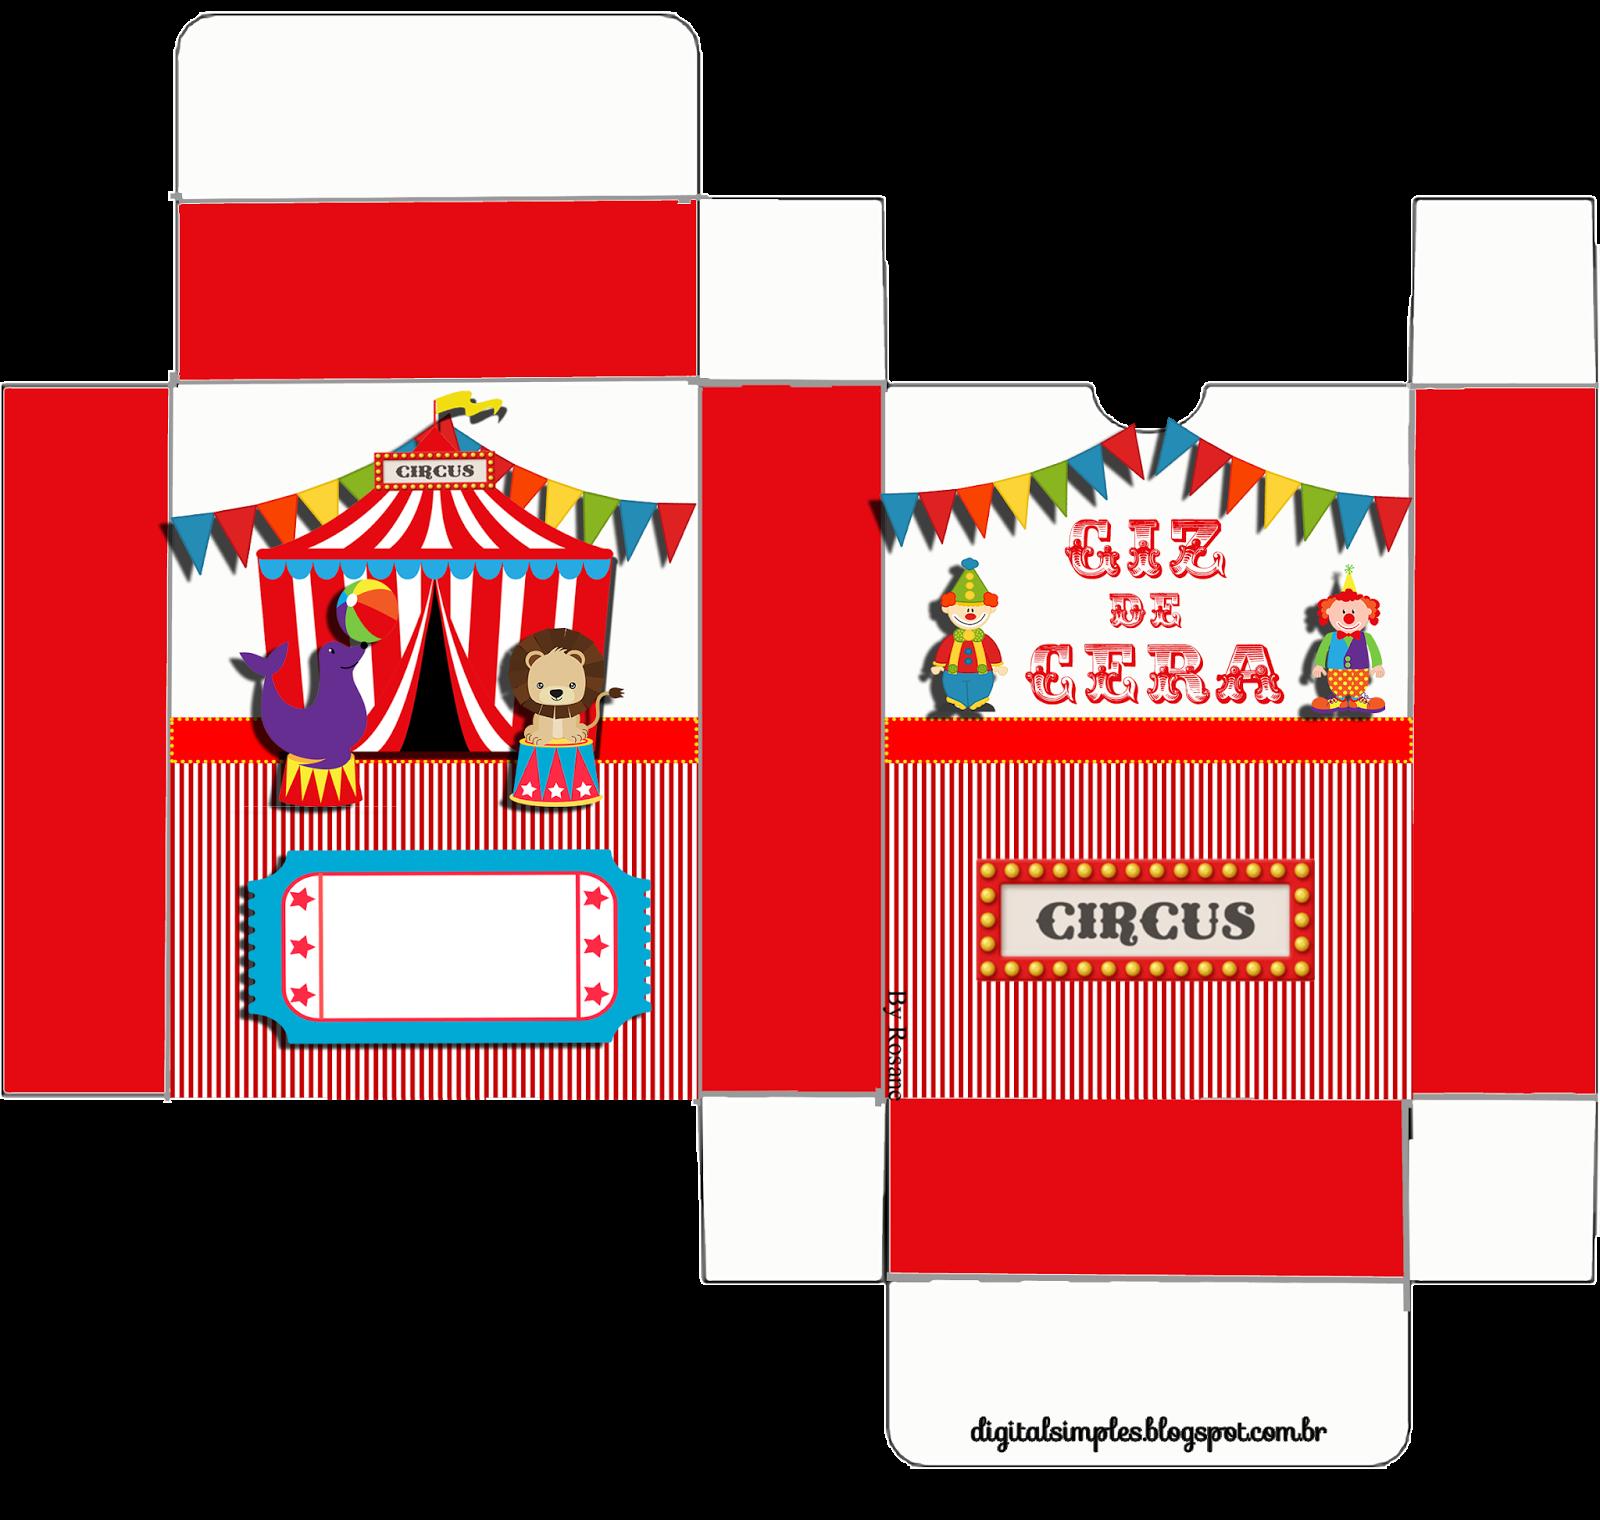 Kit De Personalizados Tema Circo Para Imprimir Convites